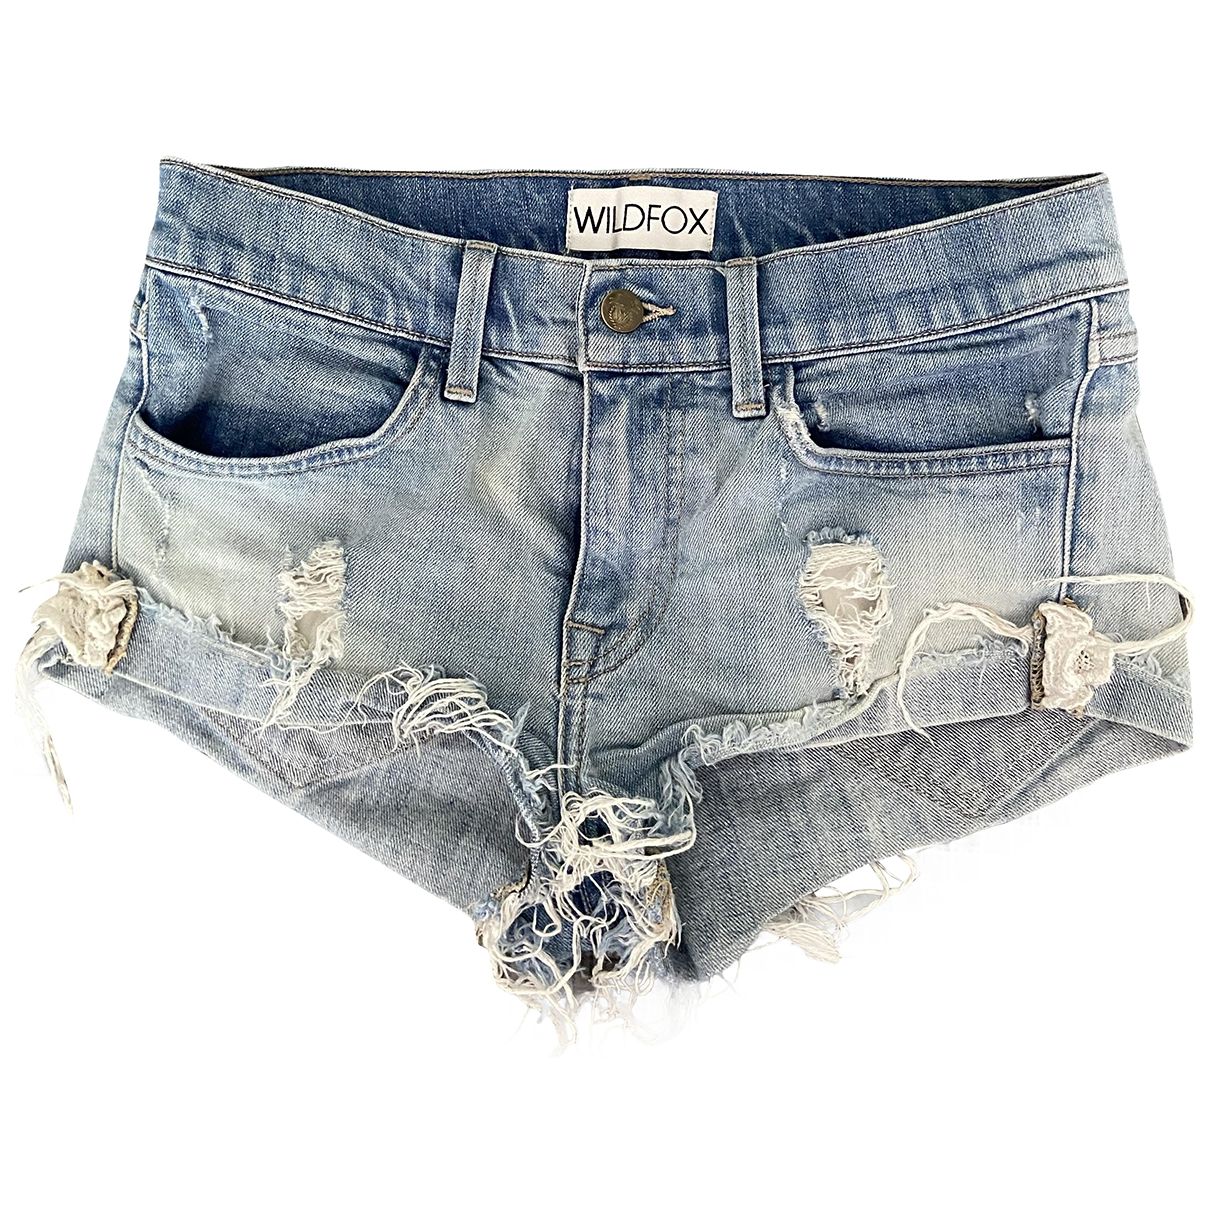 Wildfox \N Blue Denim - Jeans Shorts for Women XS International